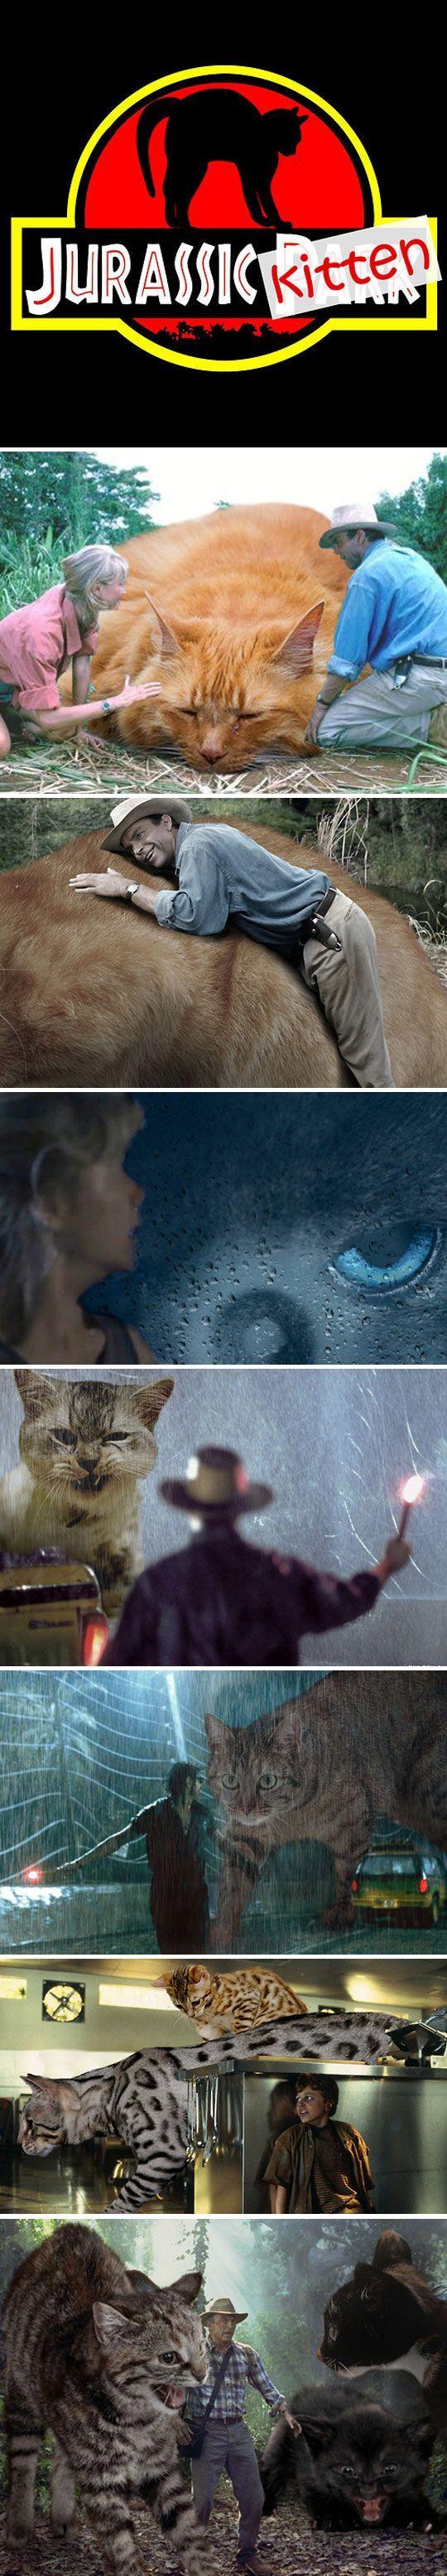 Funny Jurassic Kitten Joke Picture